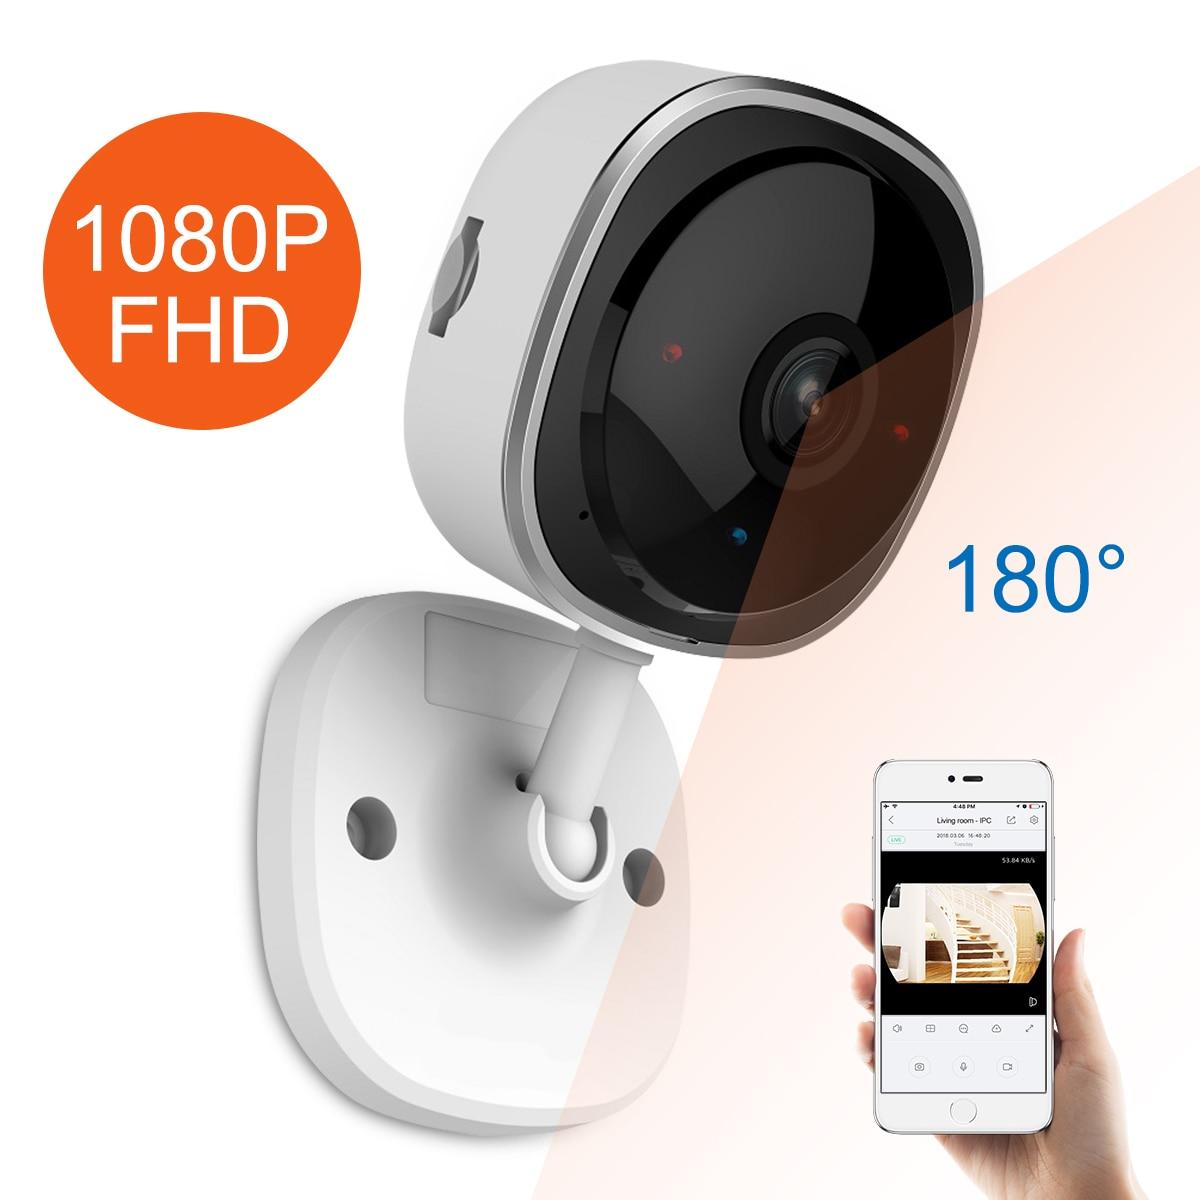 SANNCE HD 1080 p Fisheye IP Caméra Sans Fil Wifi Mini Réseau Camara Vision Nocturne Ir Accueil de Sécurité Camara Wi-Fi bébé Moniteur